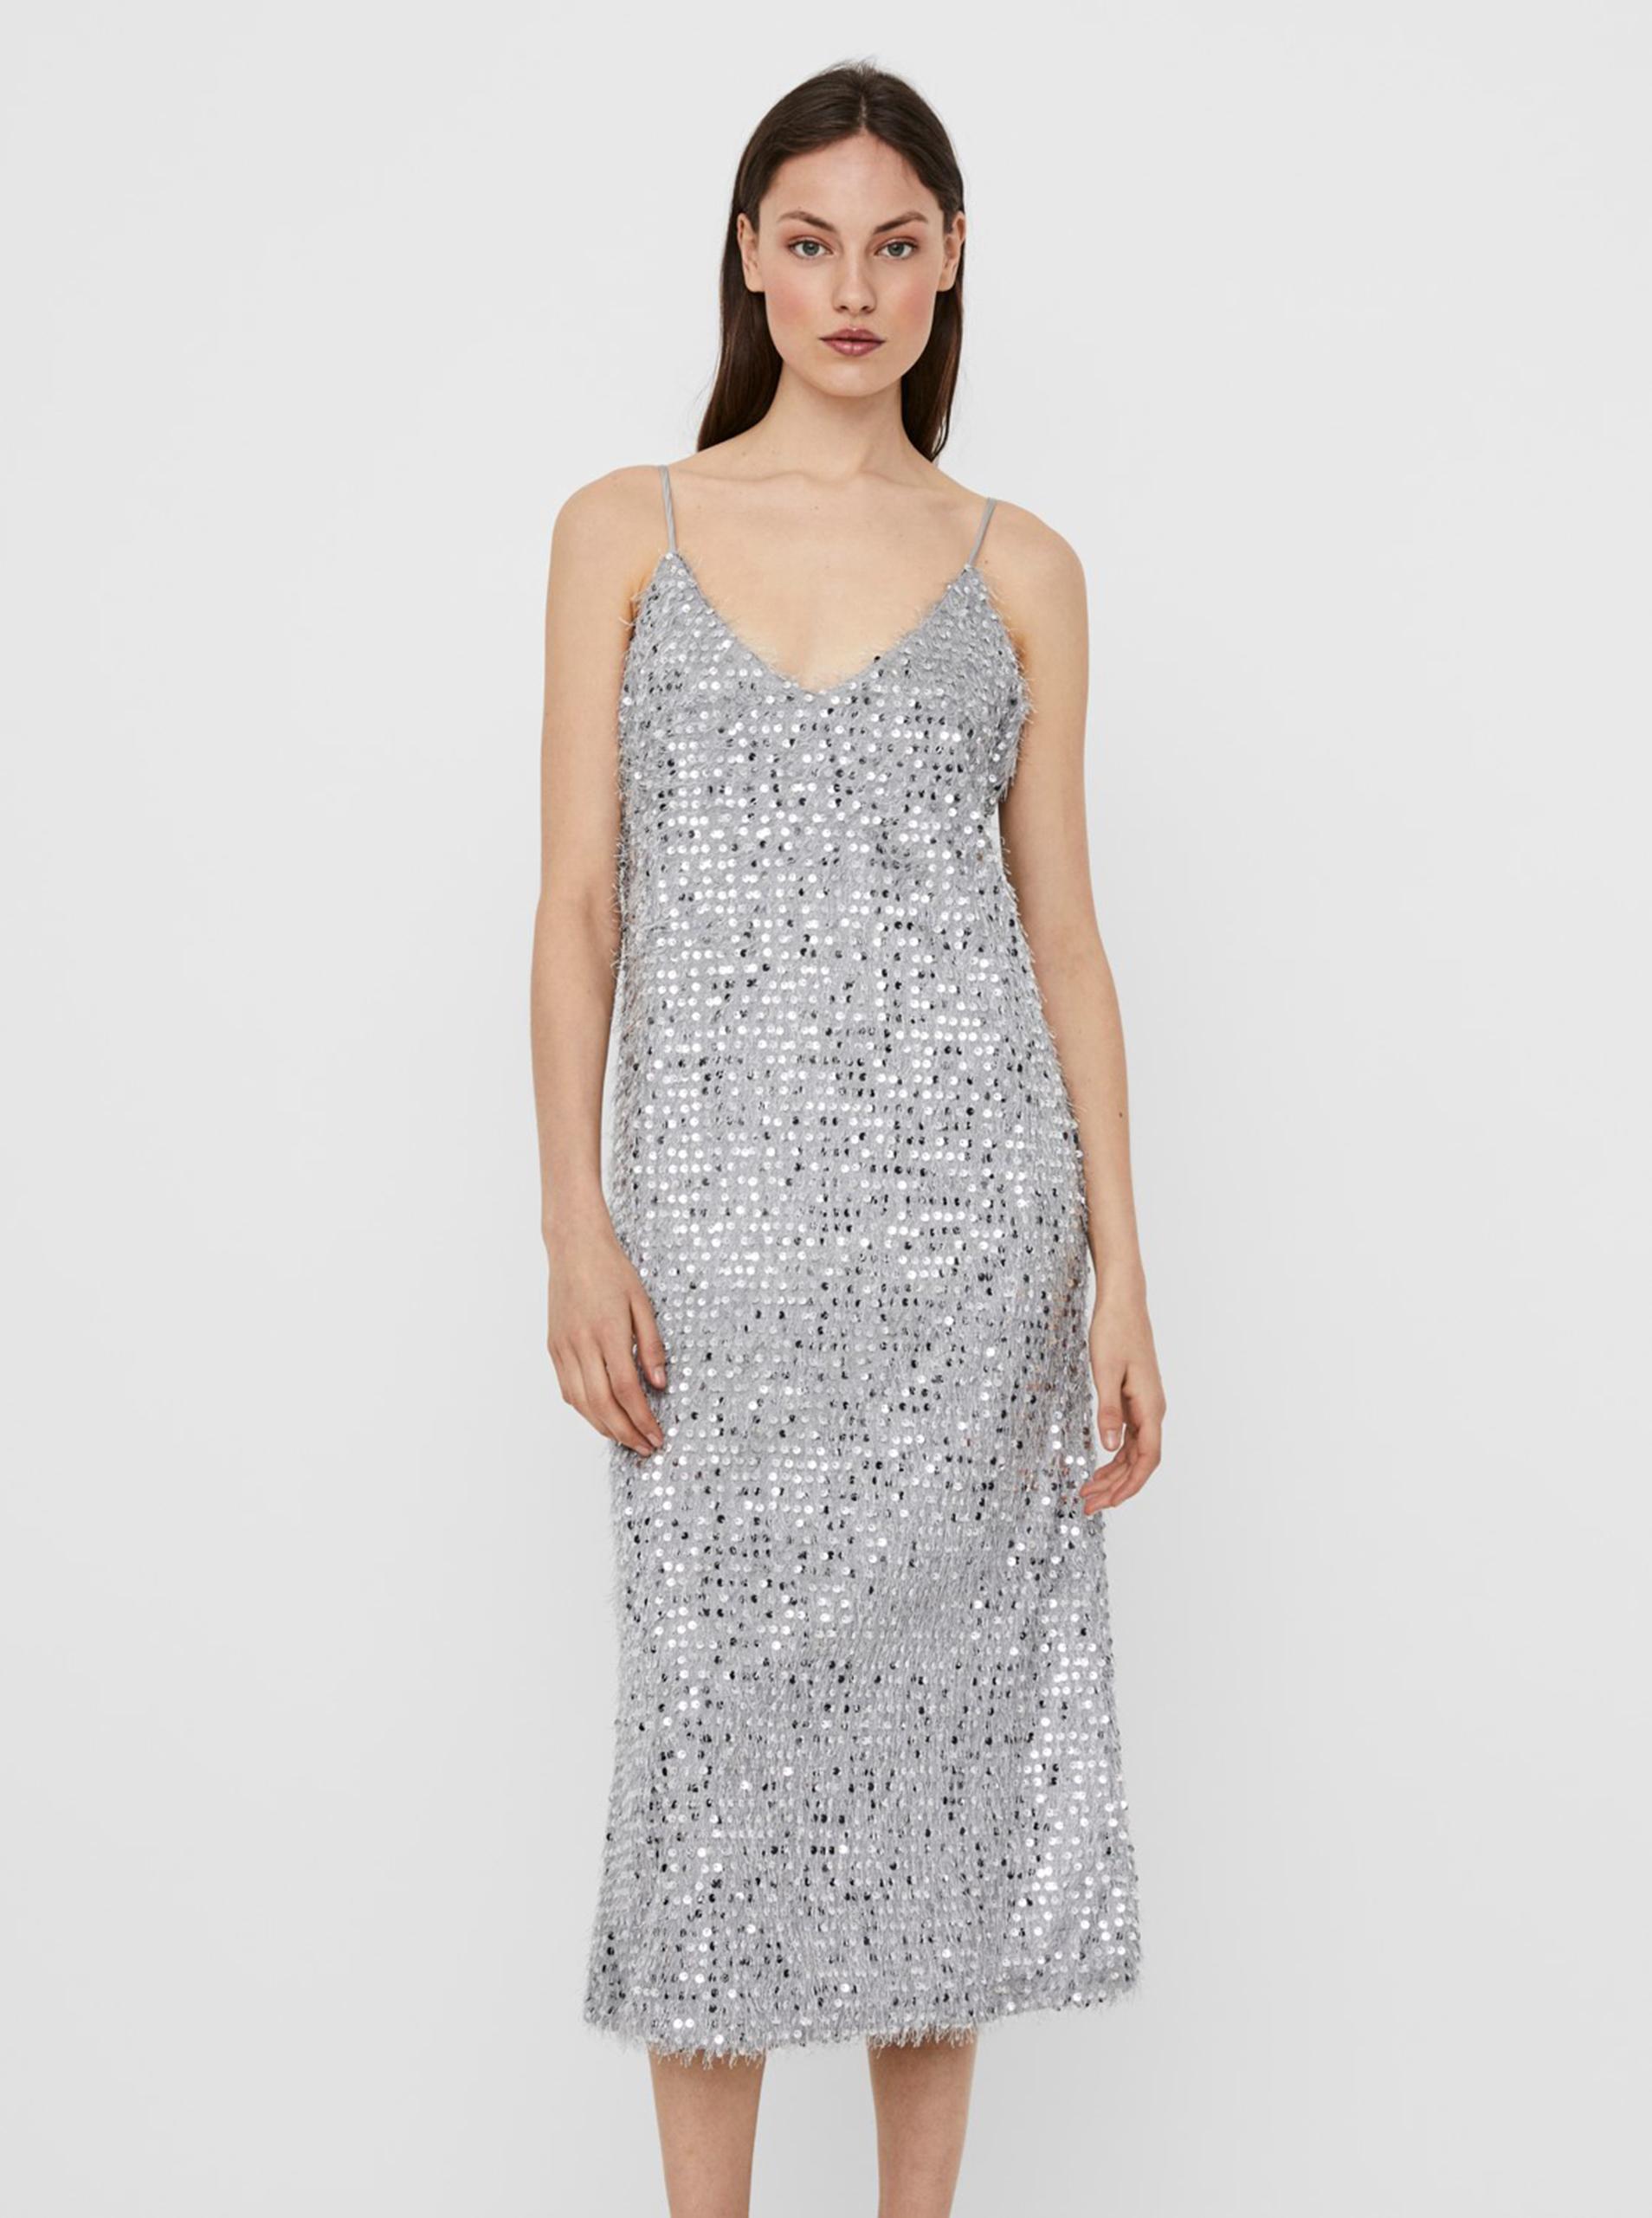 Vero Moda silver midi dress Kalmia